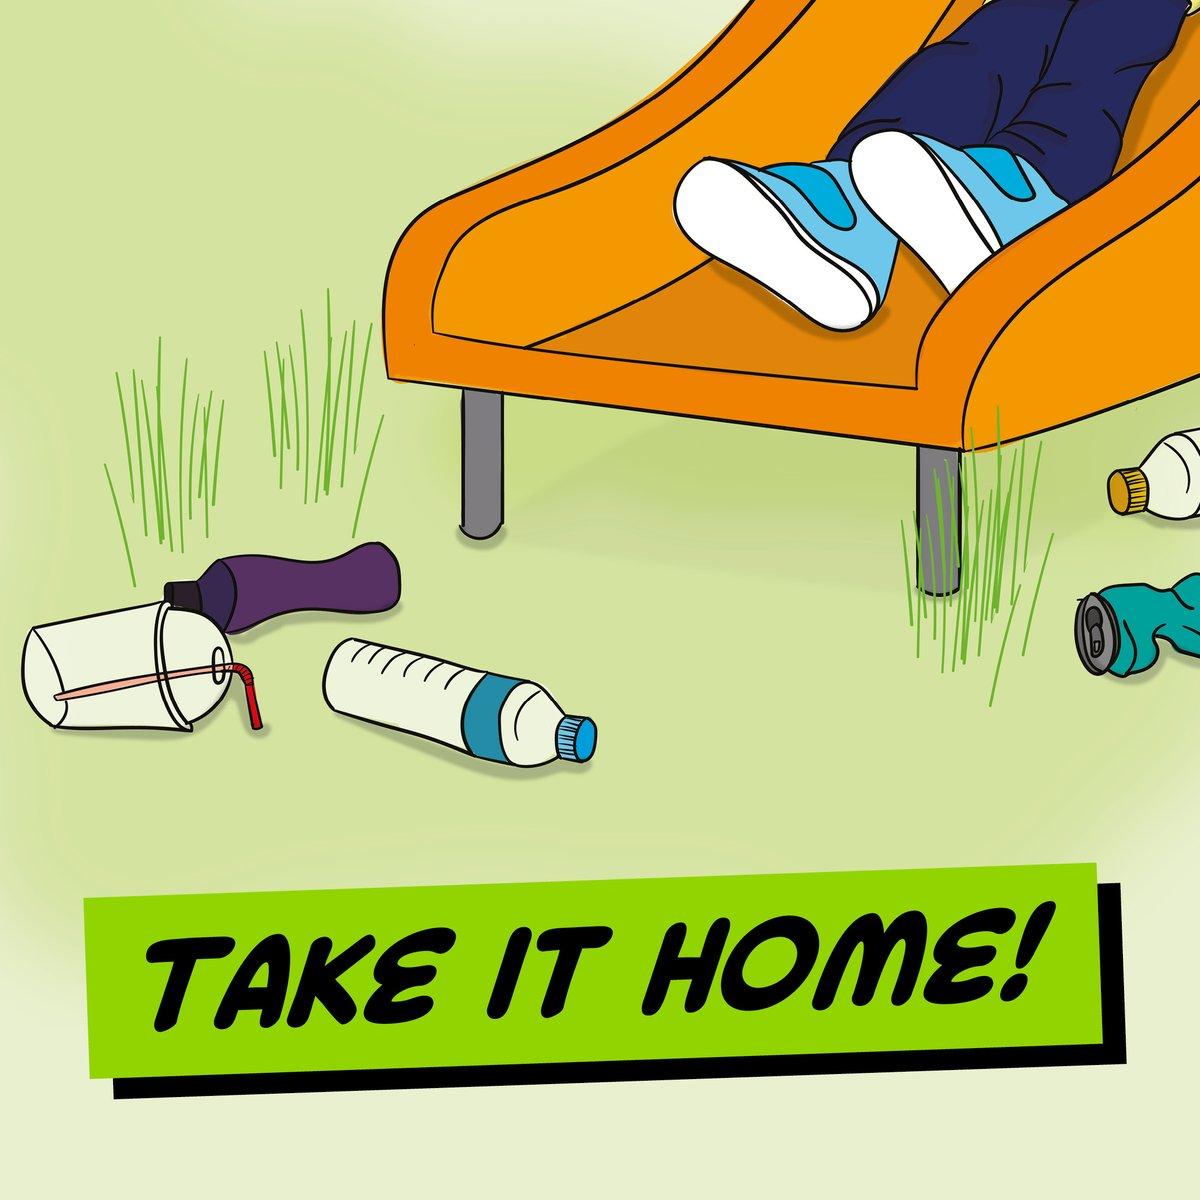 Litter Bugs - Litter Bug Clip Art - Free Transparent PNG Clipart Images  Download